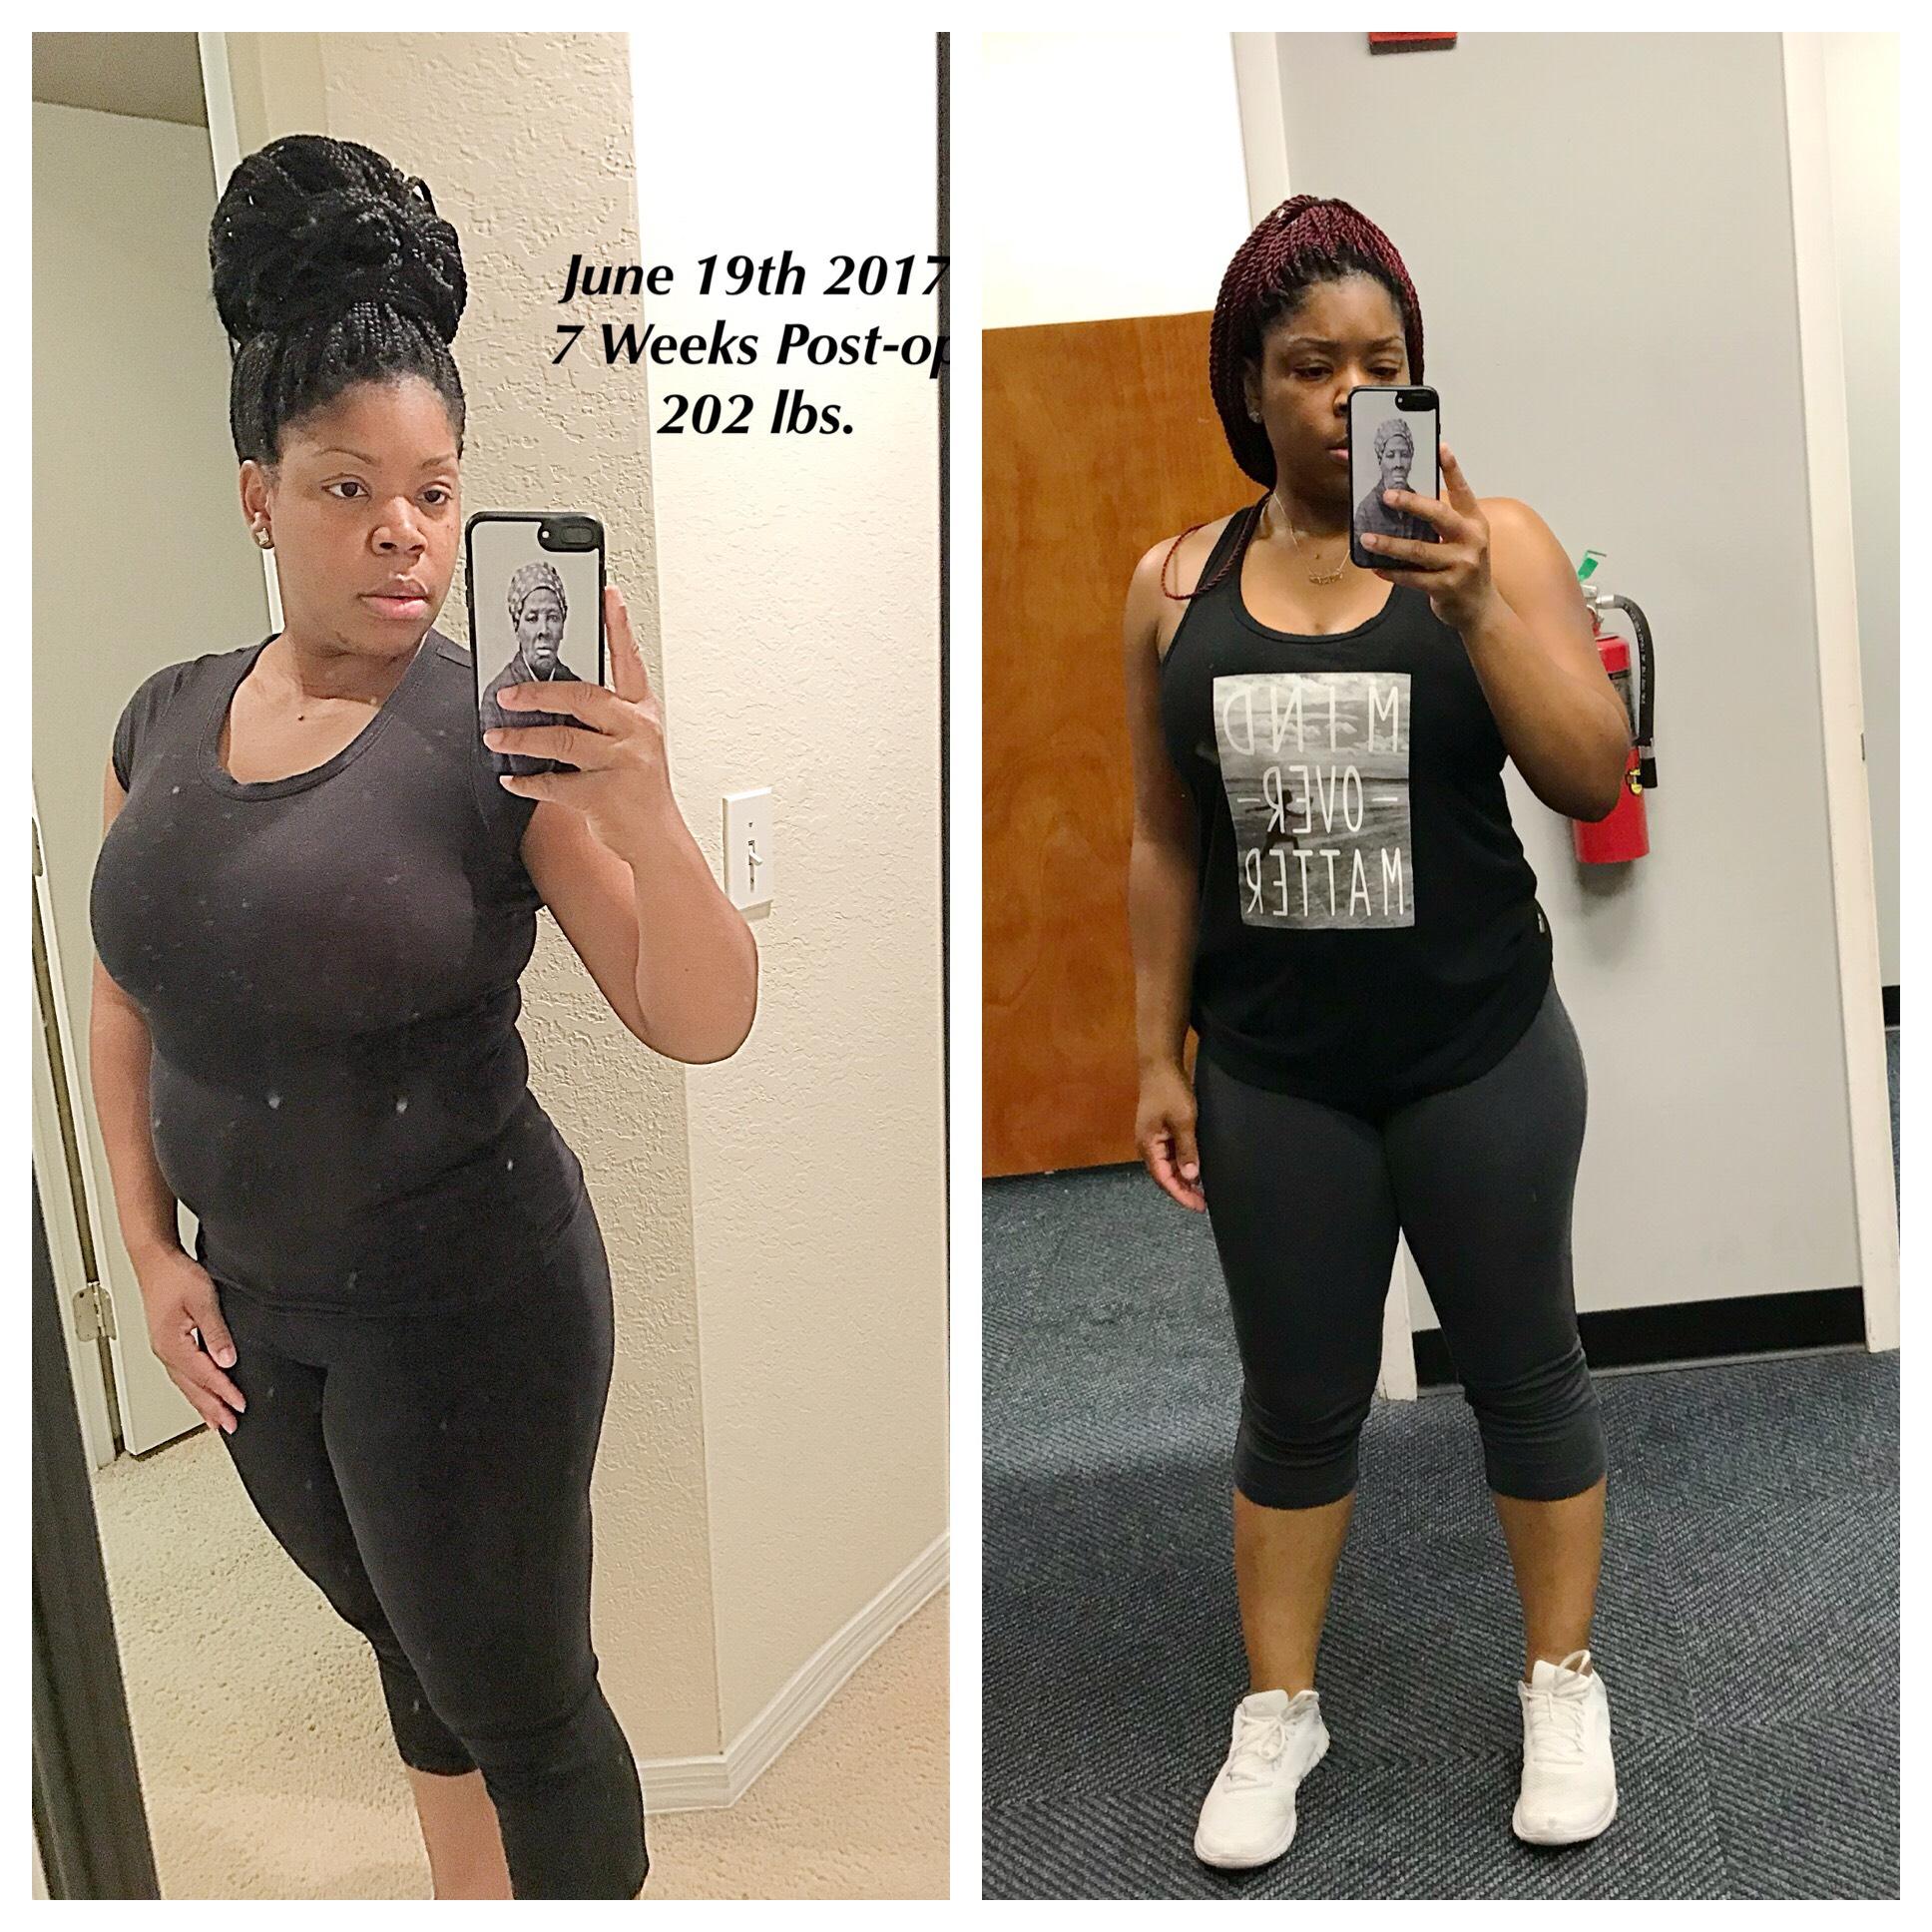 Shakayla #weightlossbeforeandafter #weightlosstransformation #weightlosstips